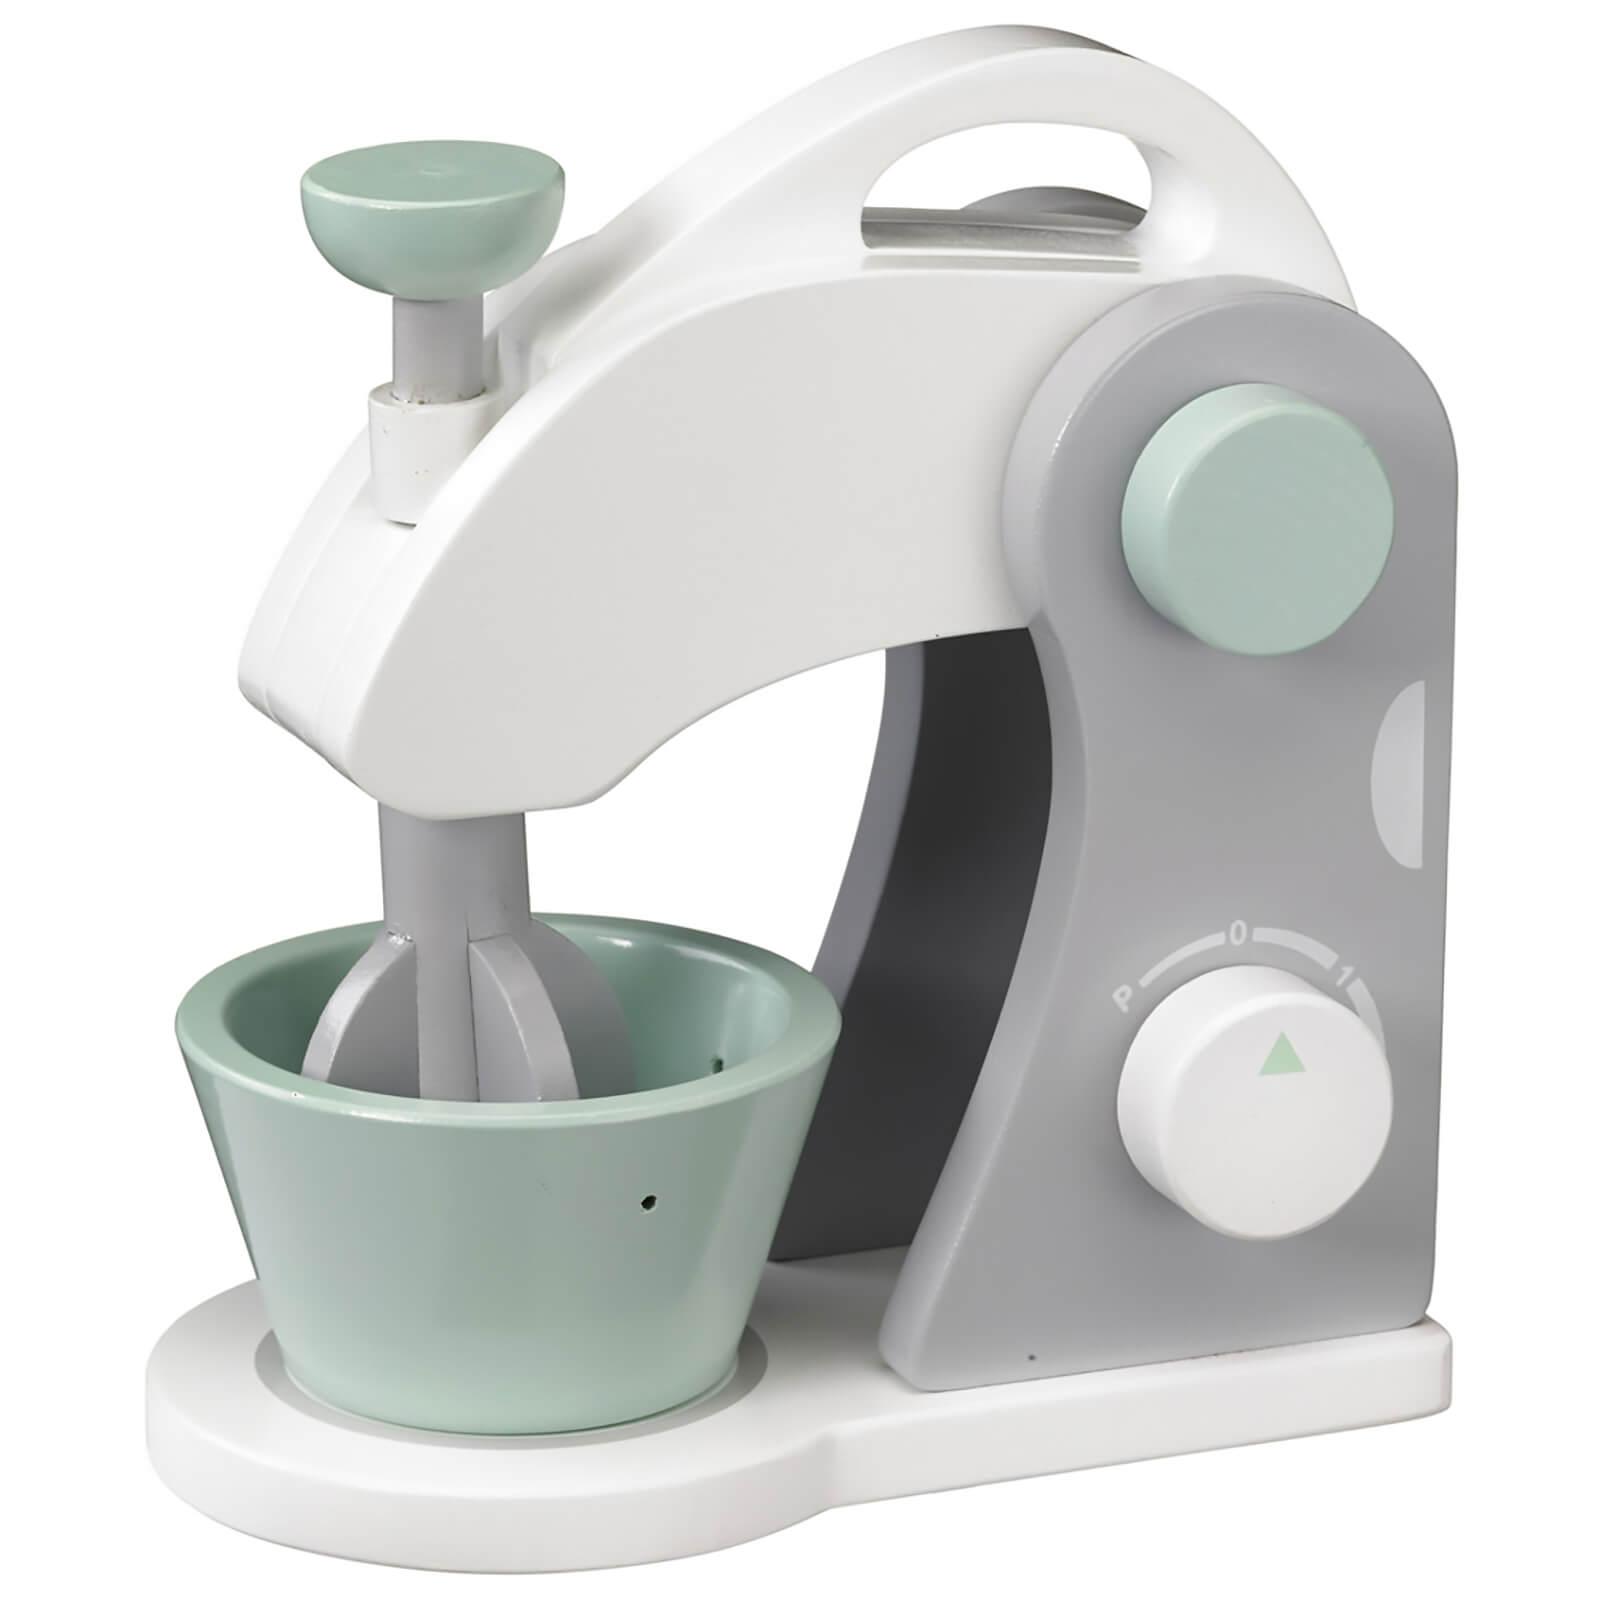 Kids Concept Food Mixer Set